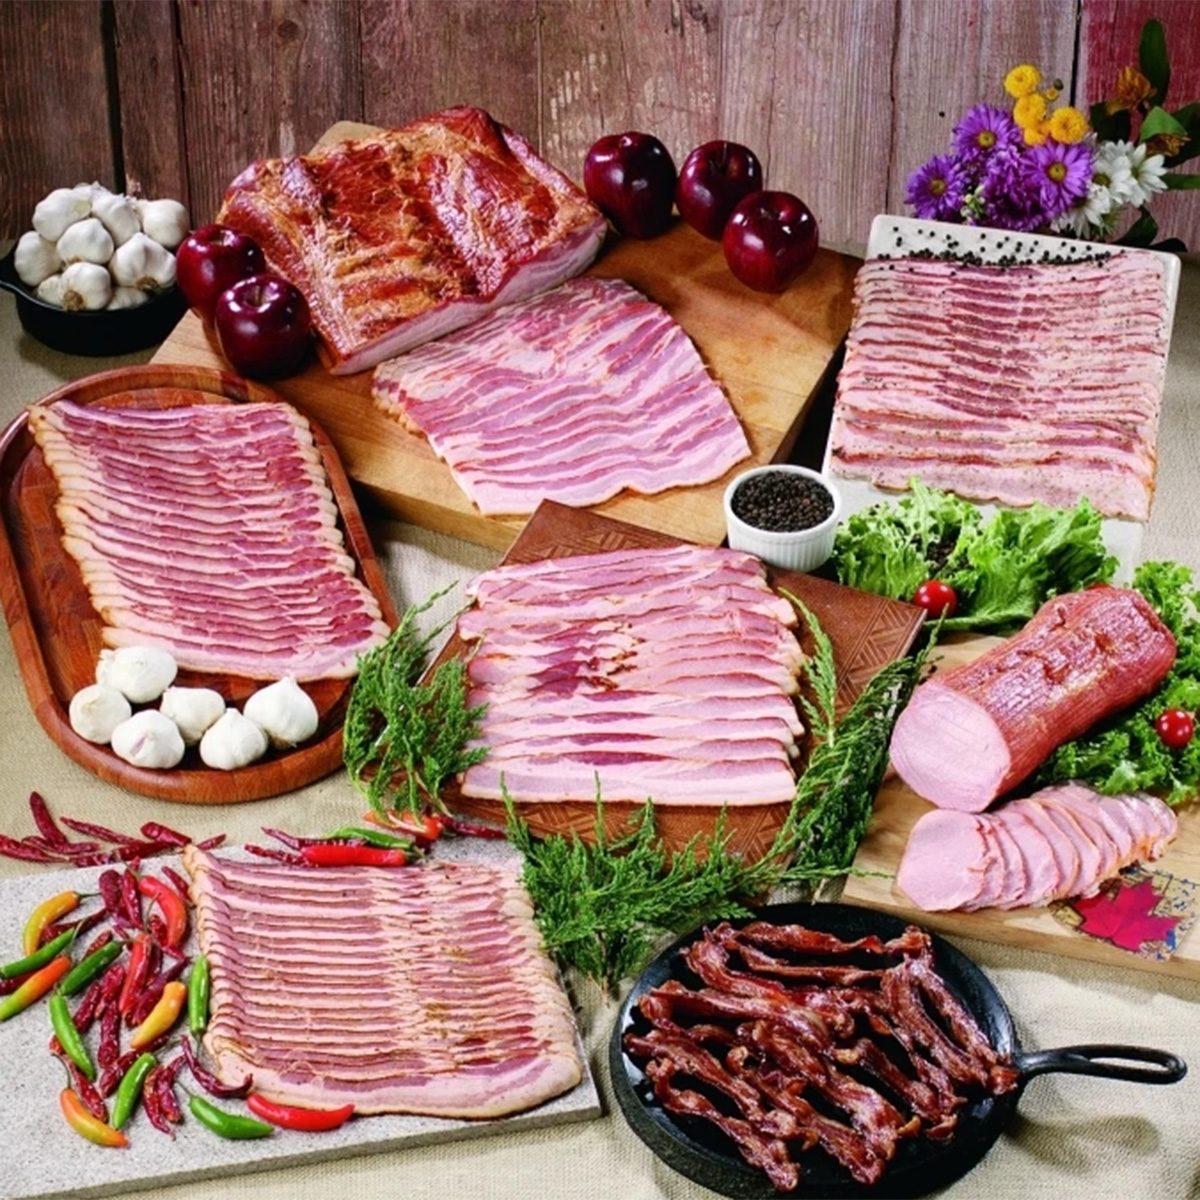 Nodine's Smokehouse brand display of bacon